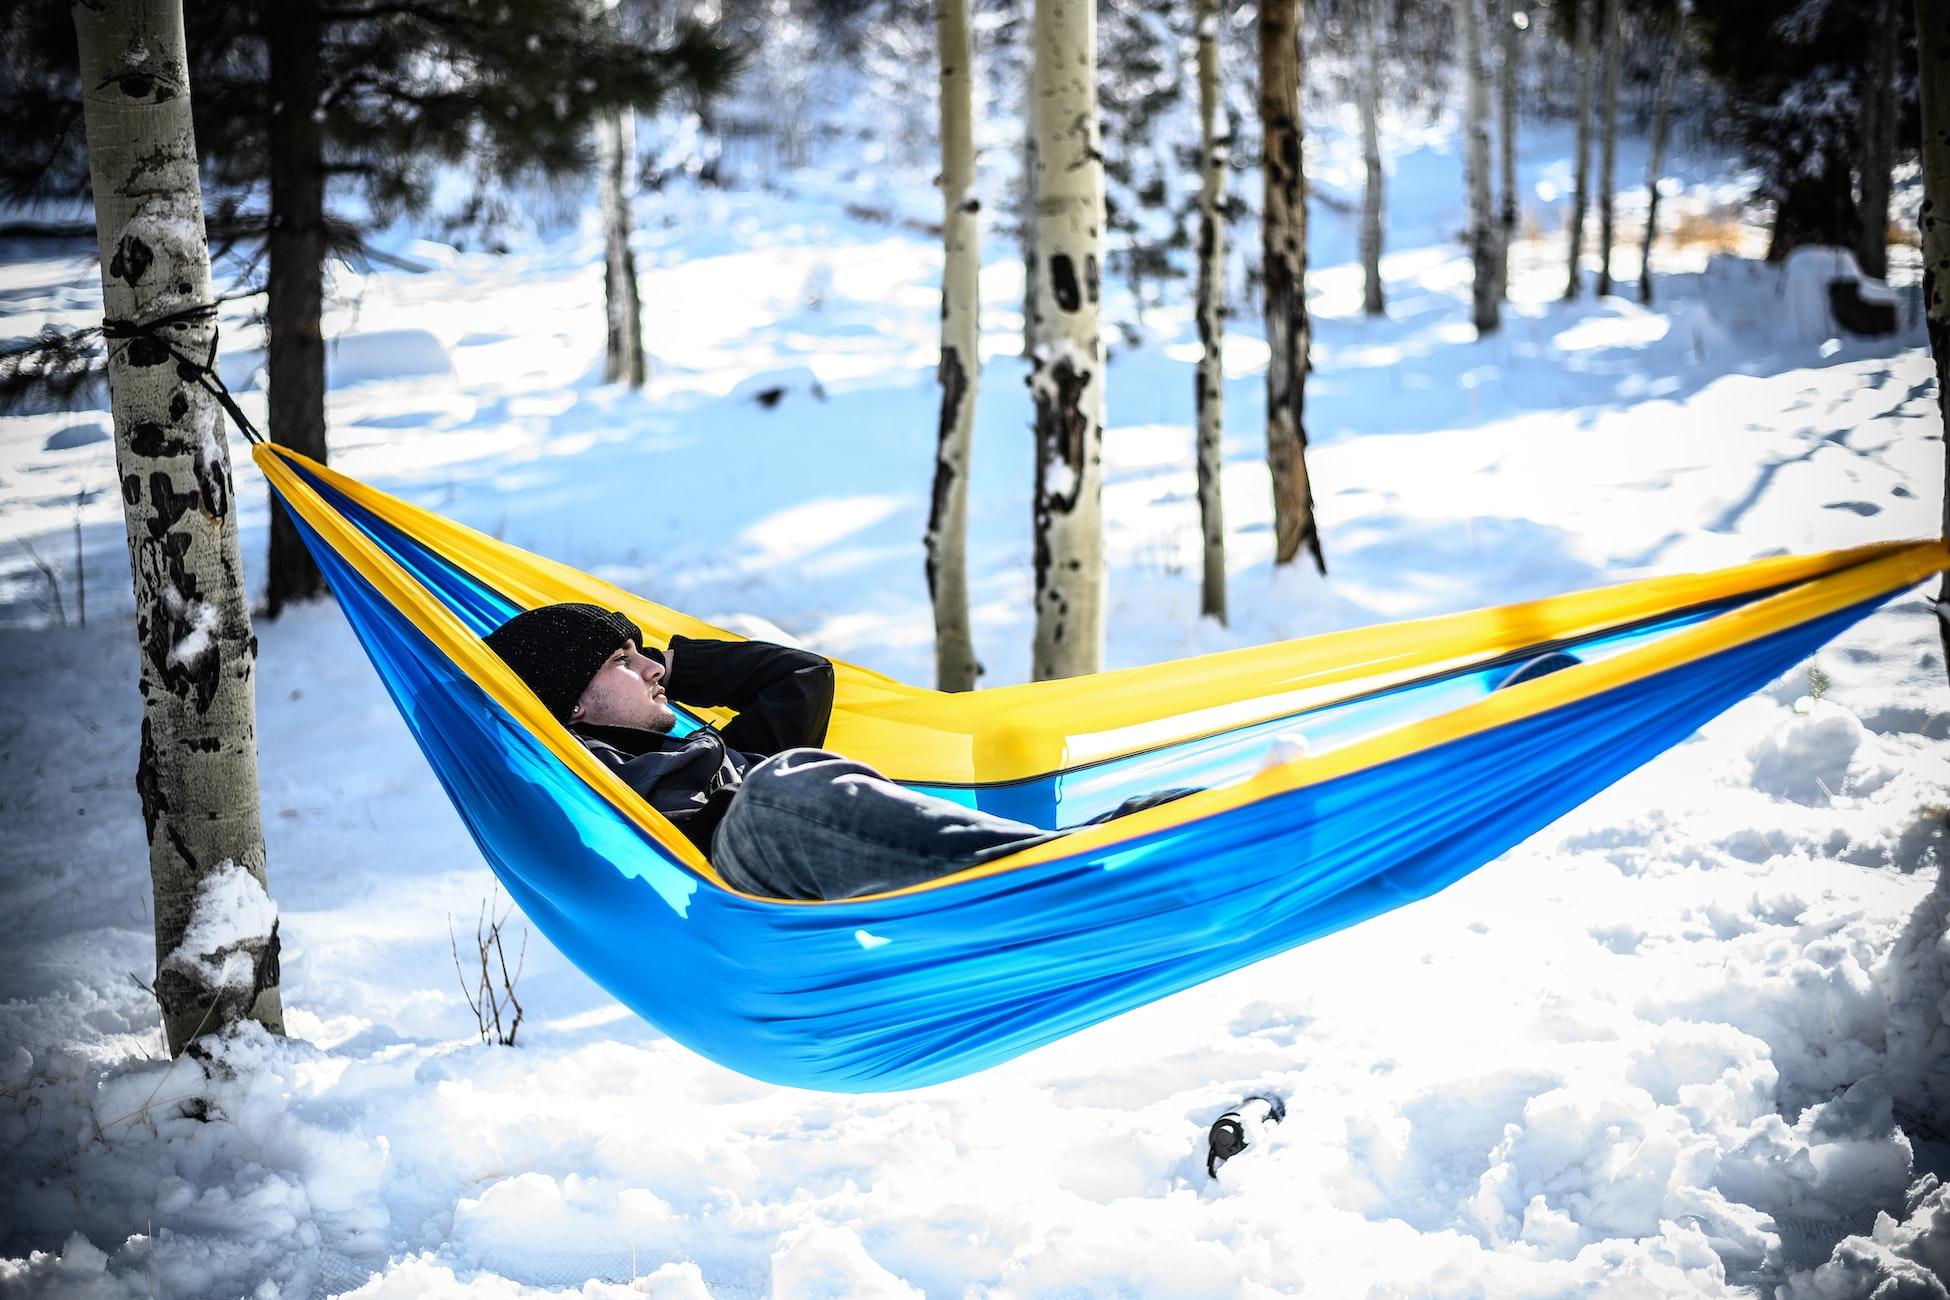 hammocking in snow